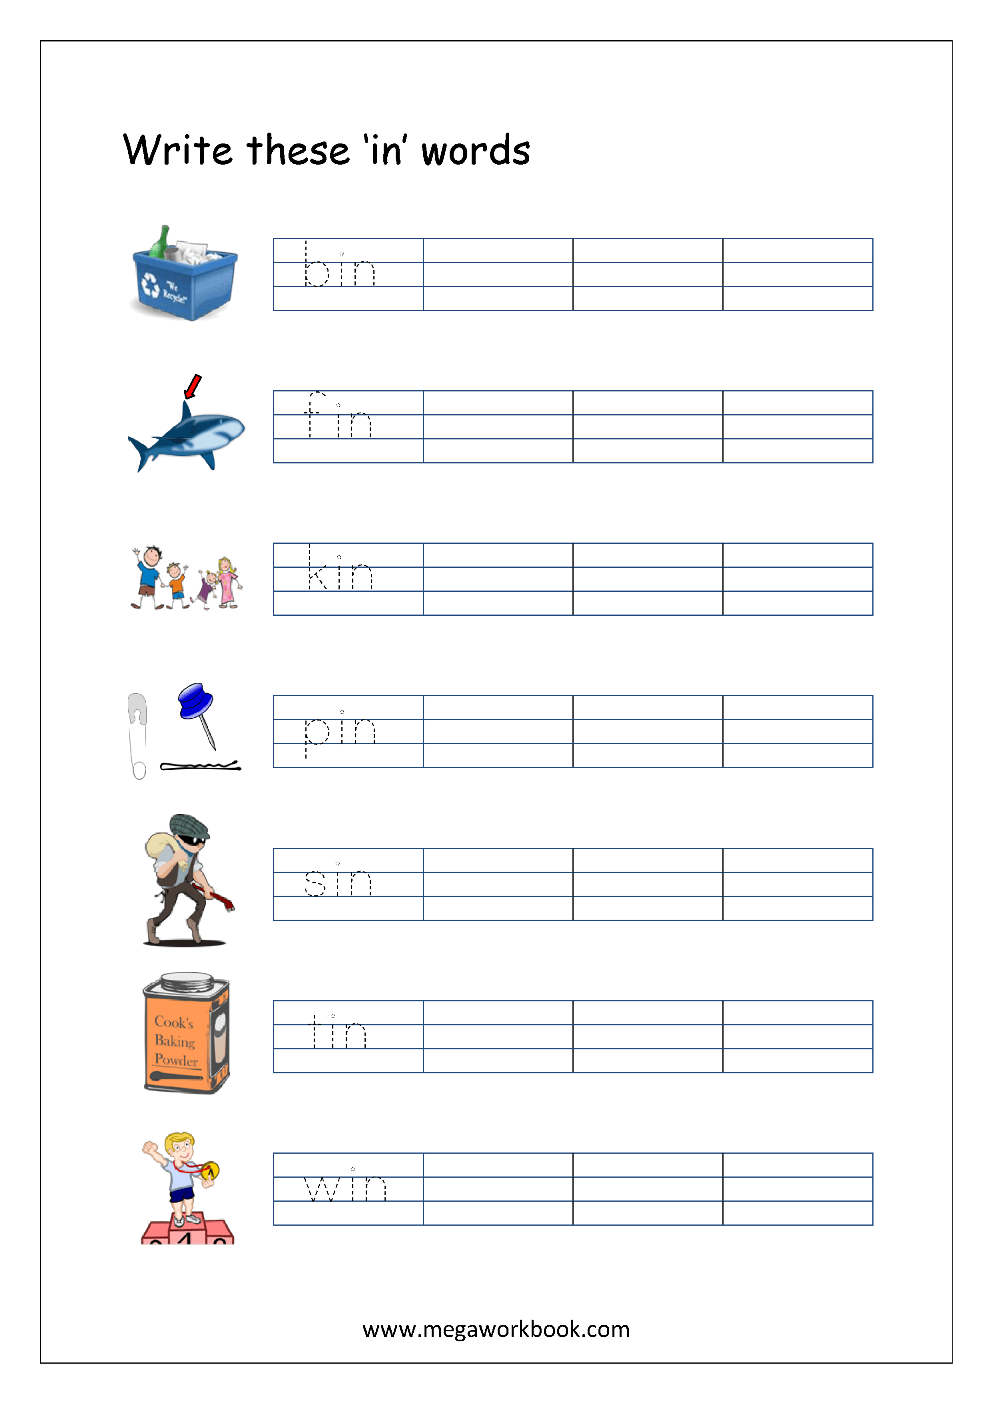 medium resolution of Free Printable CVC Words Writing Worksheets For Kids - Three Letter Rhyming  Words For Kindergarten - MegaWorkbook